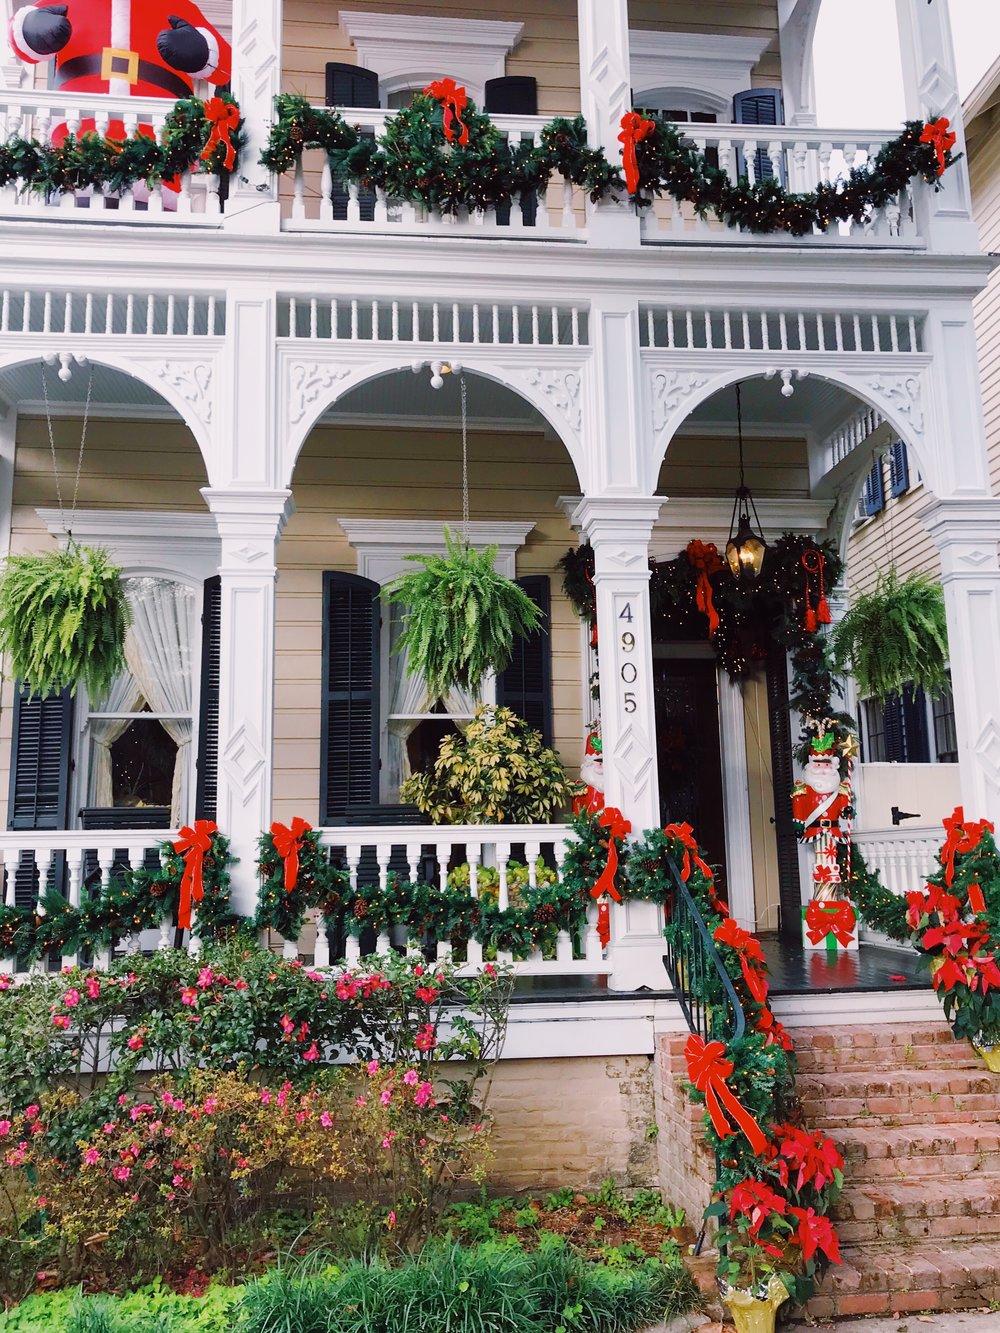 new-orleans-christmas-decoration-lauren-schwaiger-travel-blog.jpg